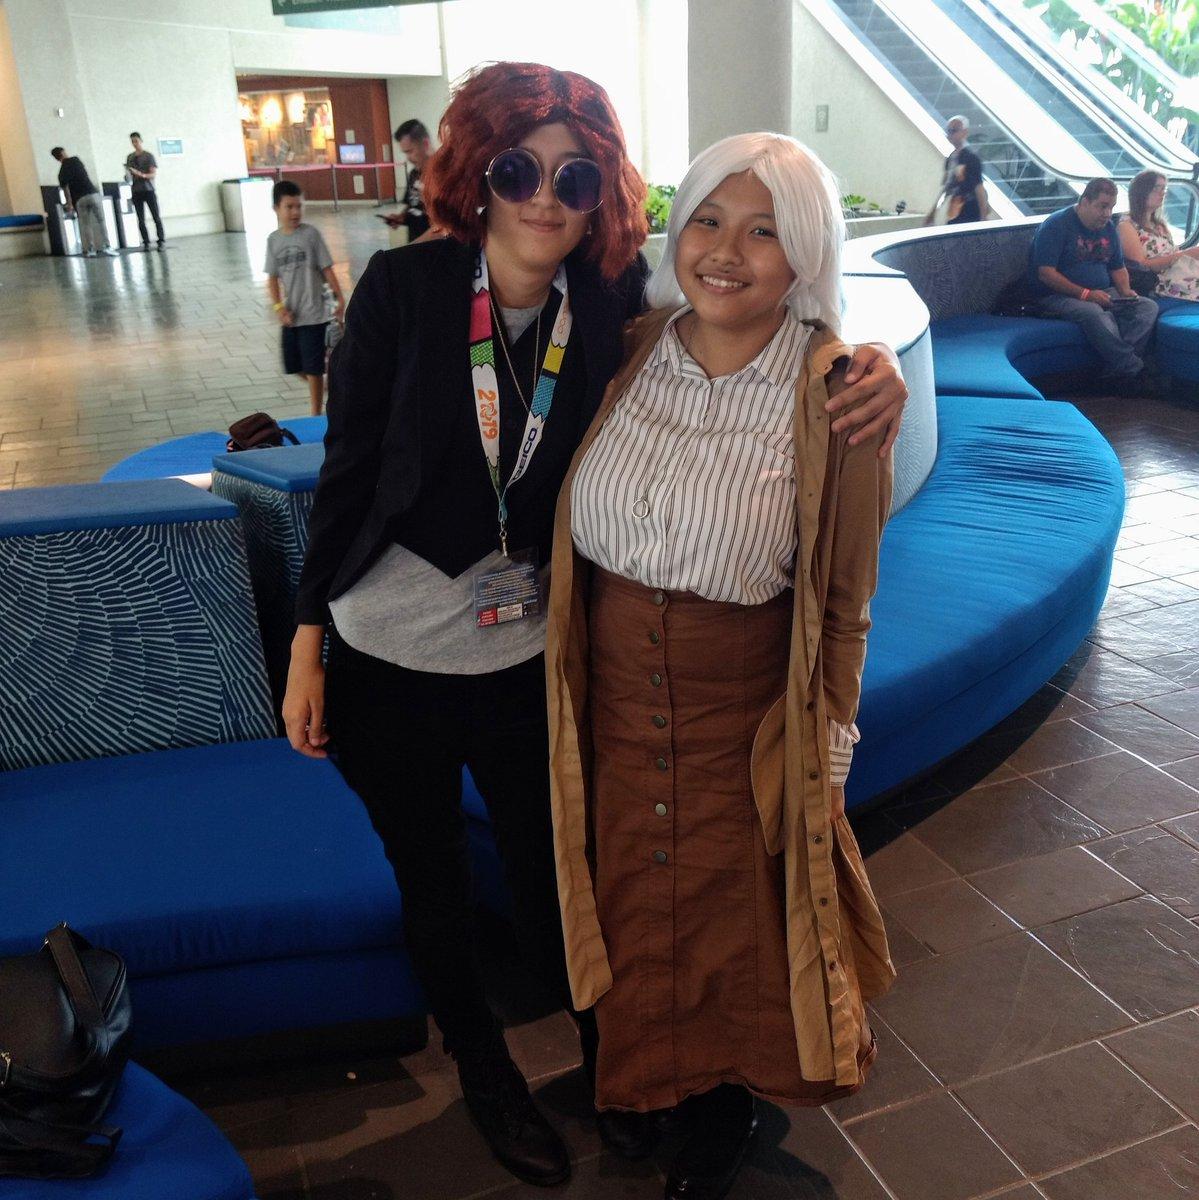 A super cute Crowley and Aziraphale #crowleyxaziraphale #goodomens #cosplay #comicconhonolulu2019 https://t.co/P3Y8Rqc0qq